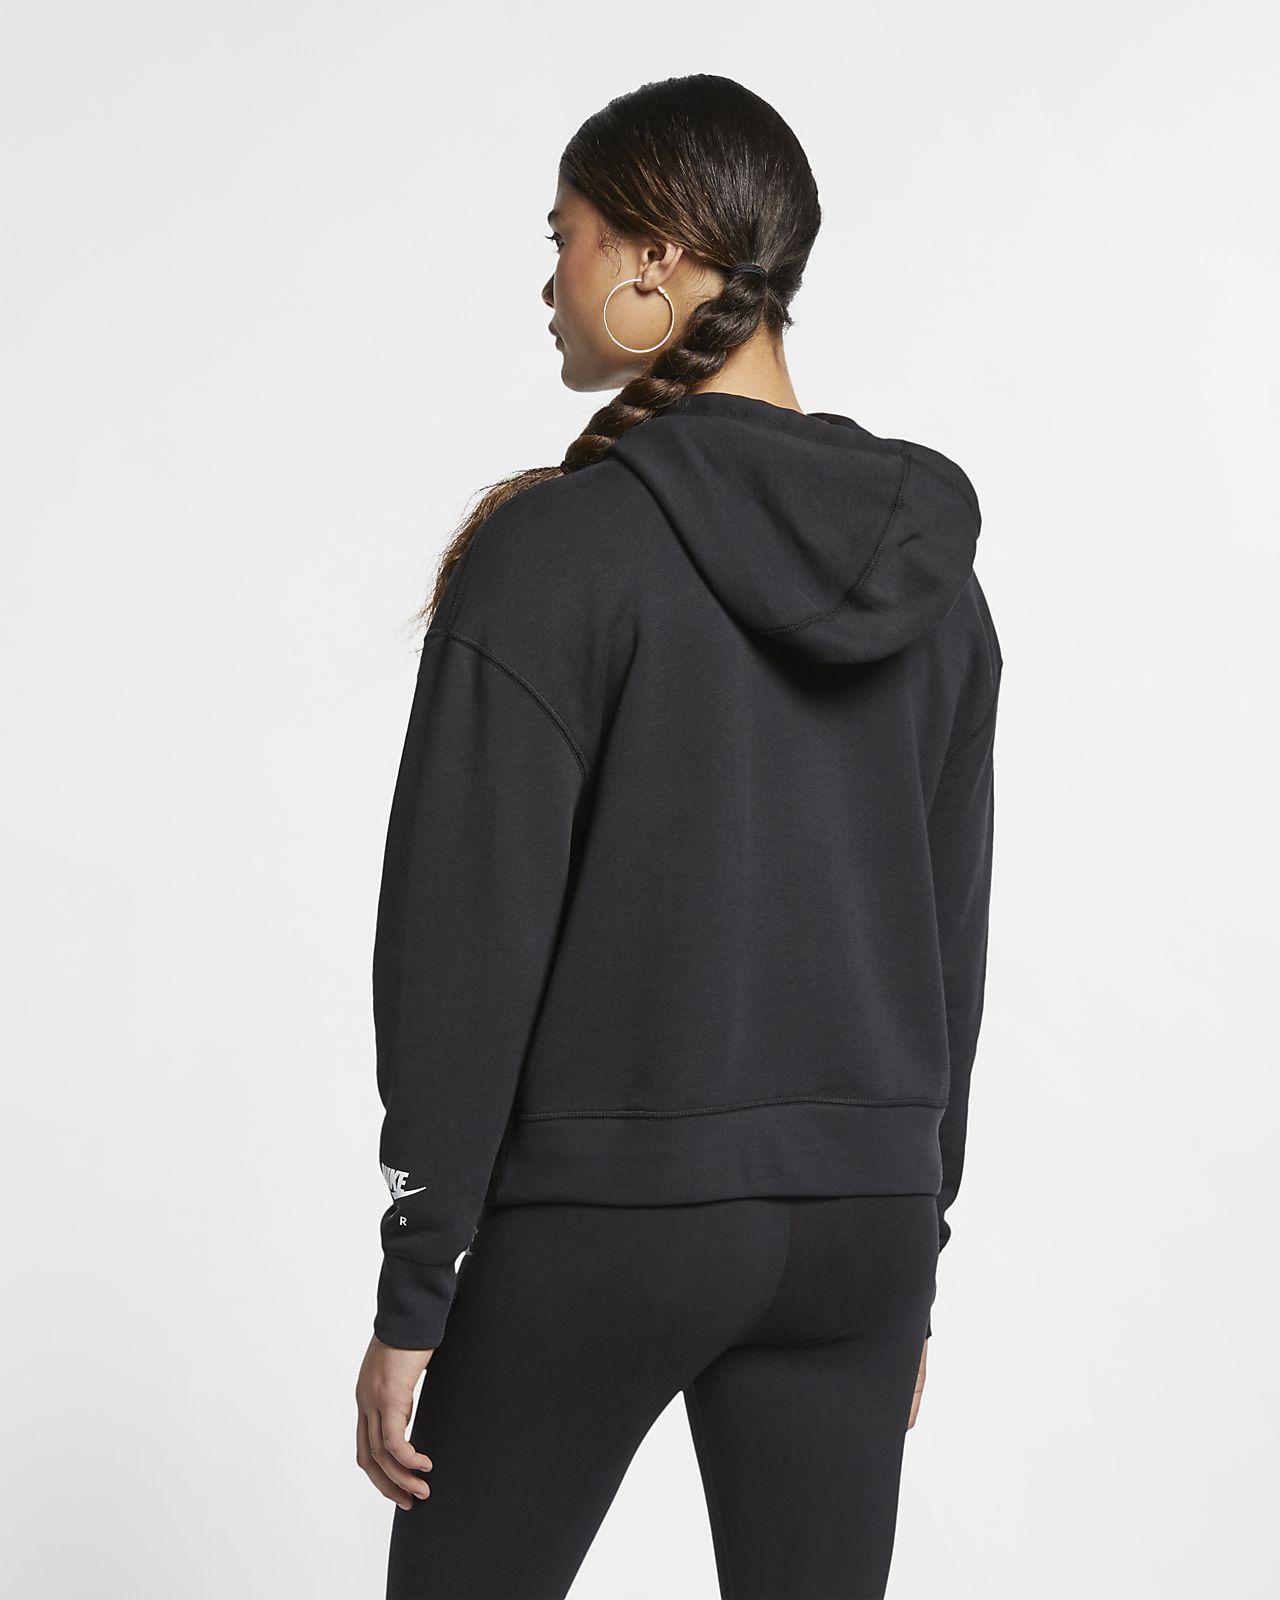 8cbbe761644e6 Sudadera con capucha para mujer Nike Air. Nike.com CL